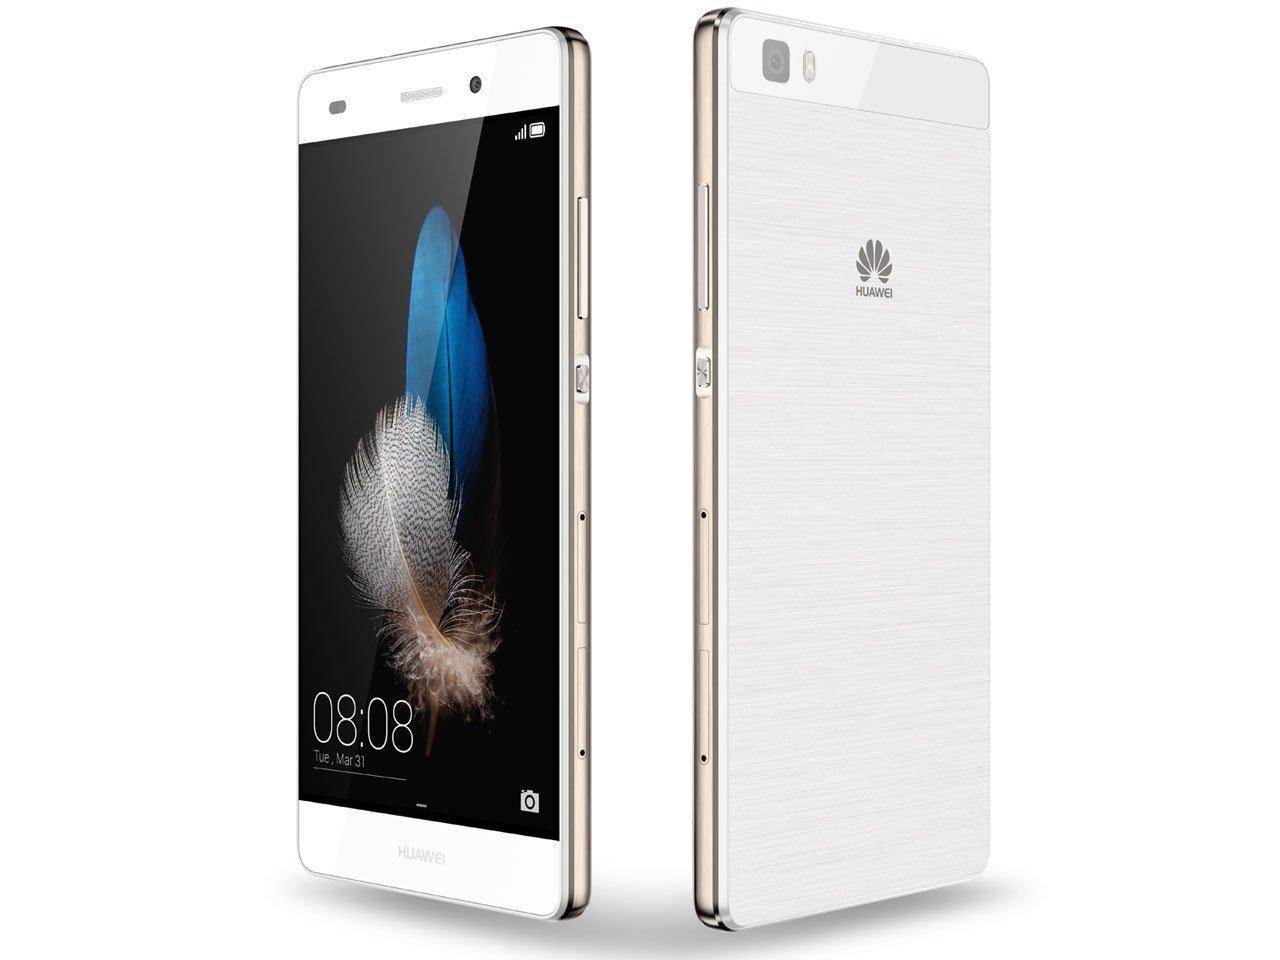 [B級品][開封品 外箱多少キズ有]【送料無料】[Huawei/ファーウェイ] SIMフリースマートフォン P8 lite 16GB (Android 5.0/オクタコア/5.0inch/nano SIM/microSIM/デュアルSIMスロット) ホワイト ALE-L02-WHITE